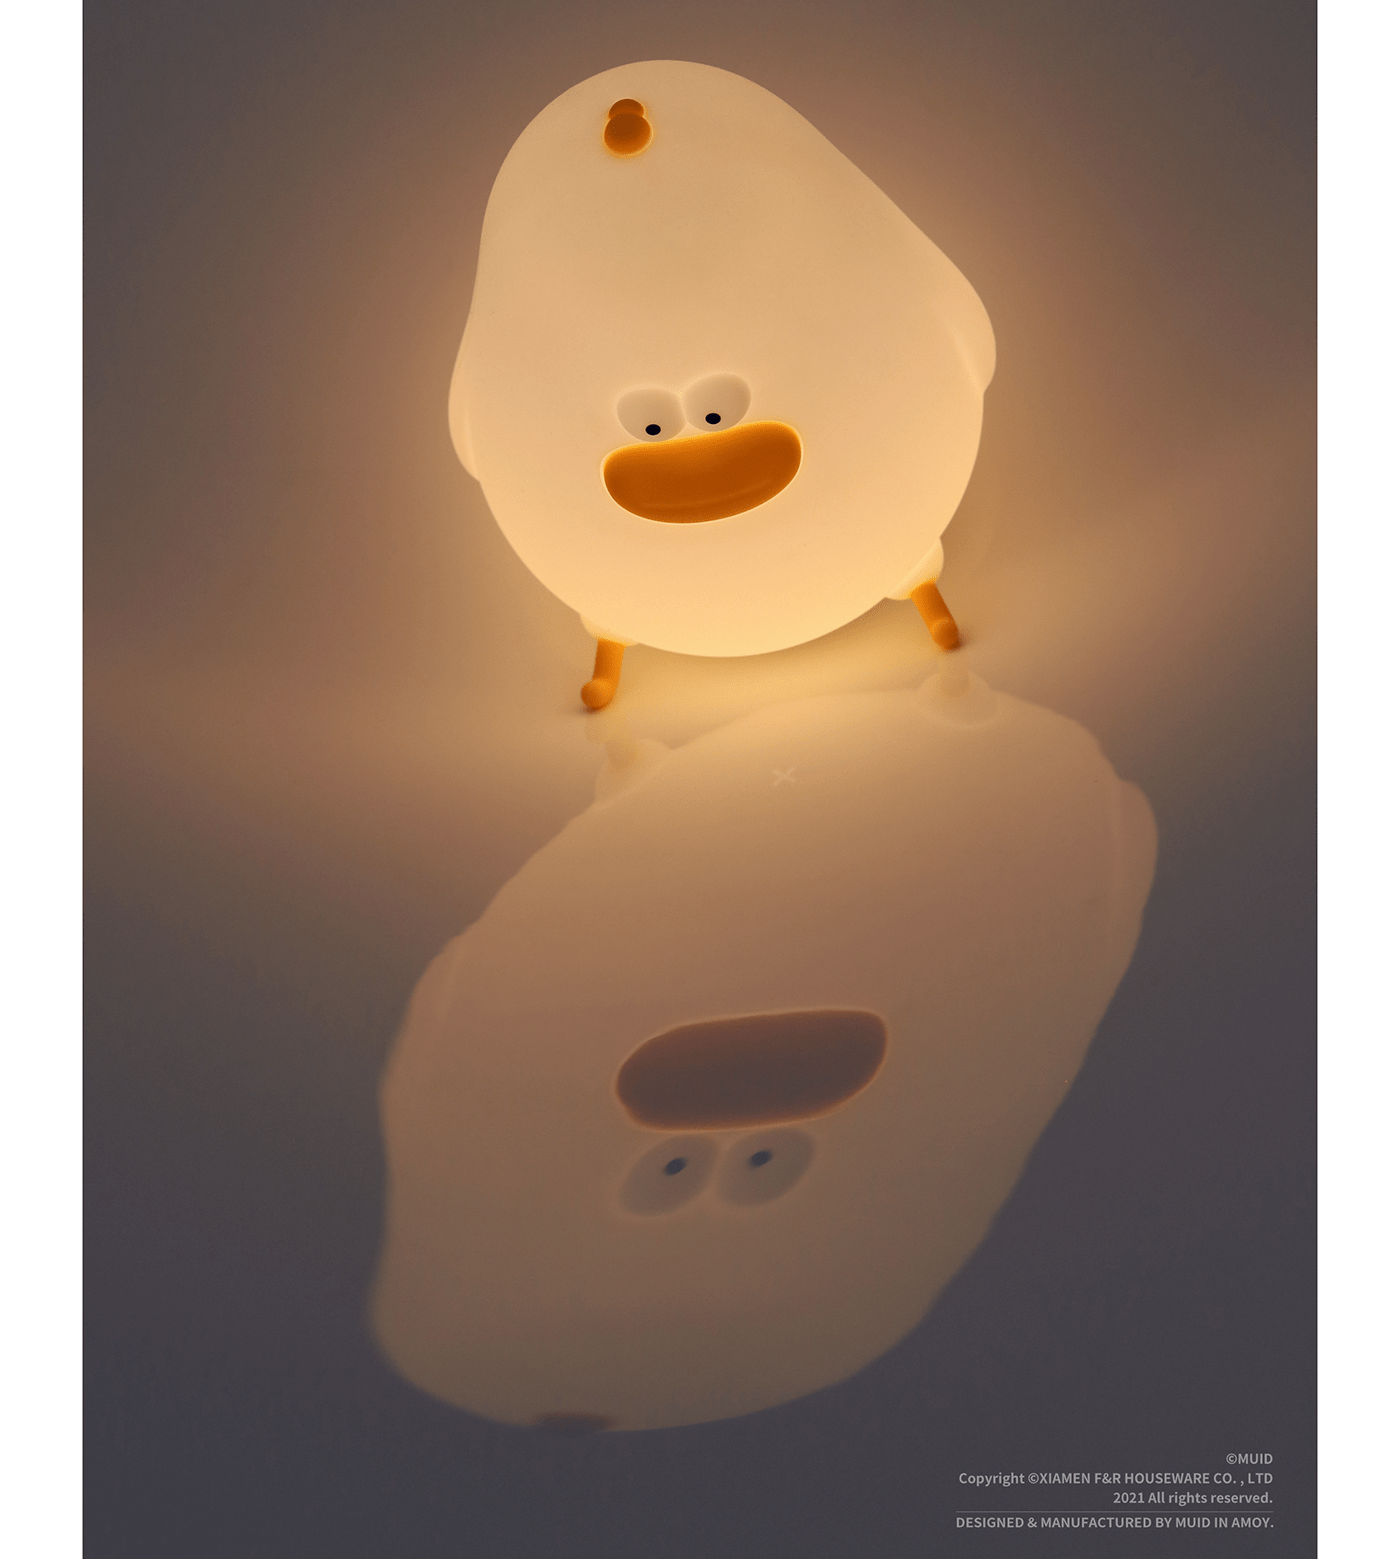 Lamp led night product design  SLEEP NIGHT 产品设计 工业设计